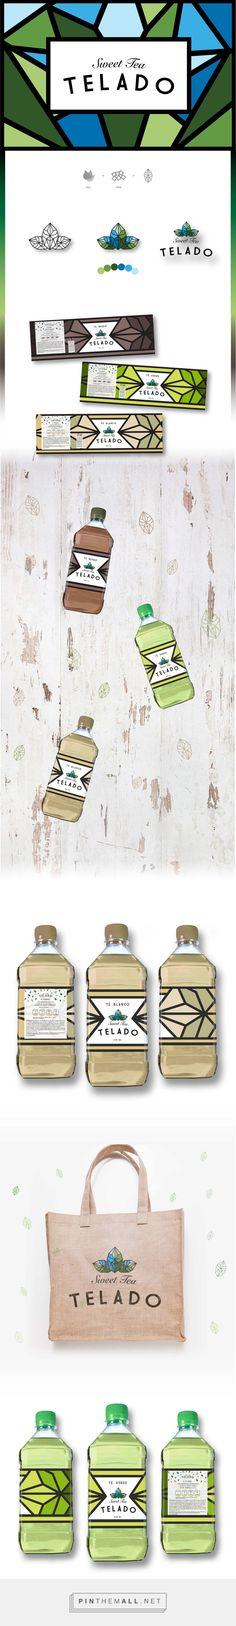 Graphic design, branding and packaging for TELADO on Behance by Celeste Lolato Buenos Aries, Argentina curated by Packaging Diva PD. Diseño de marca para línea de té helado.